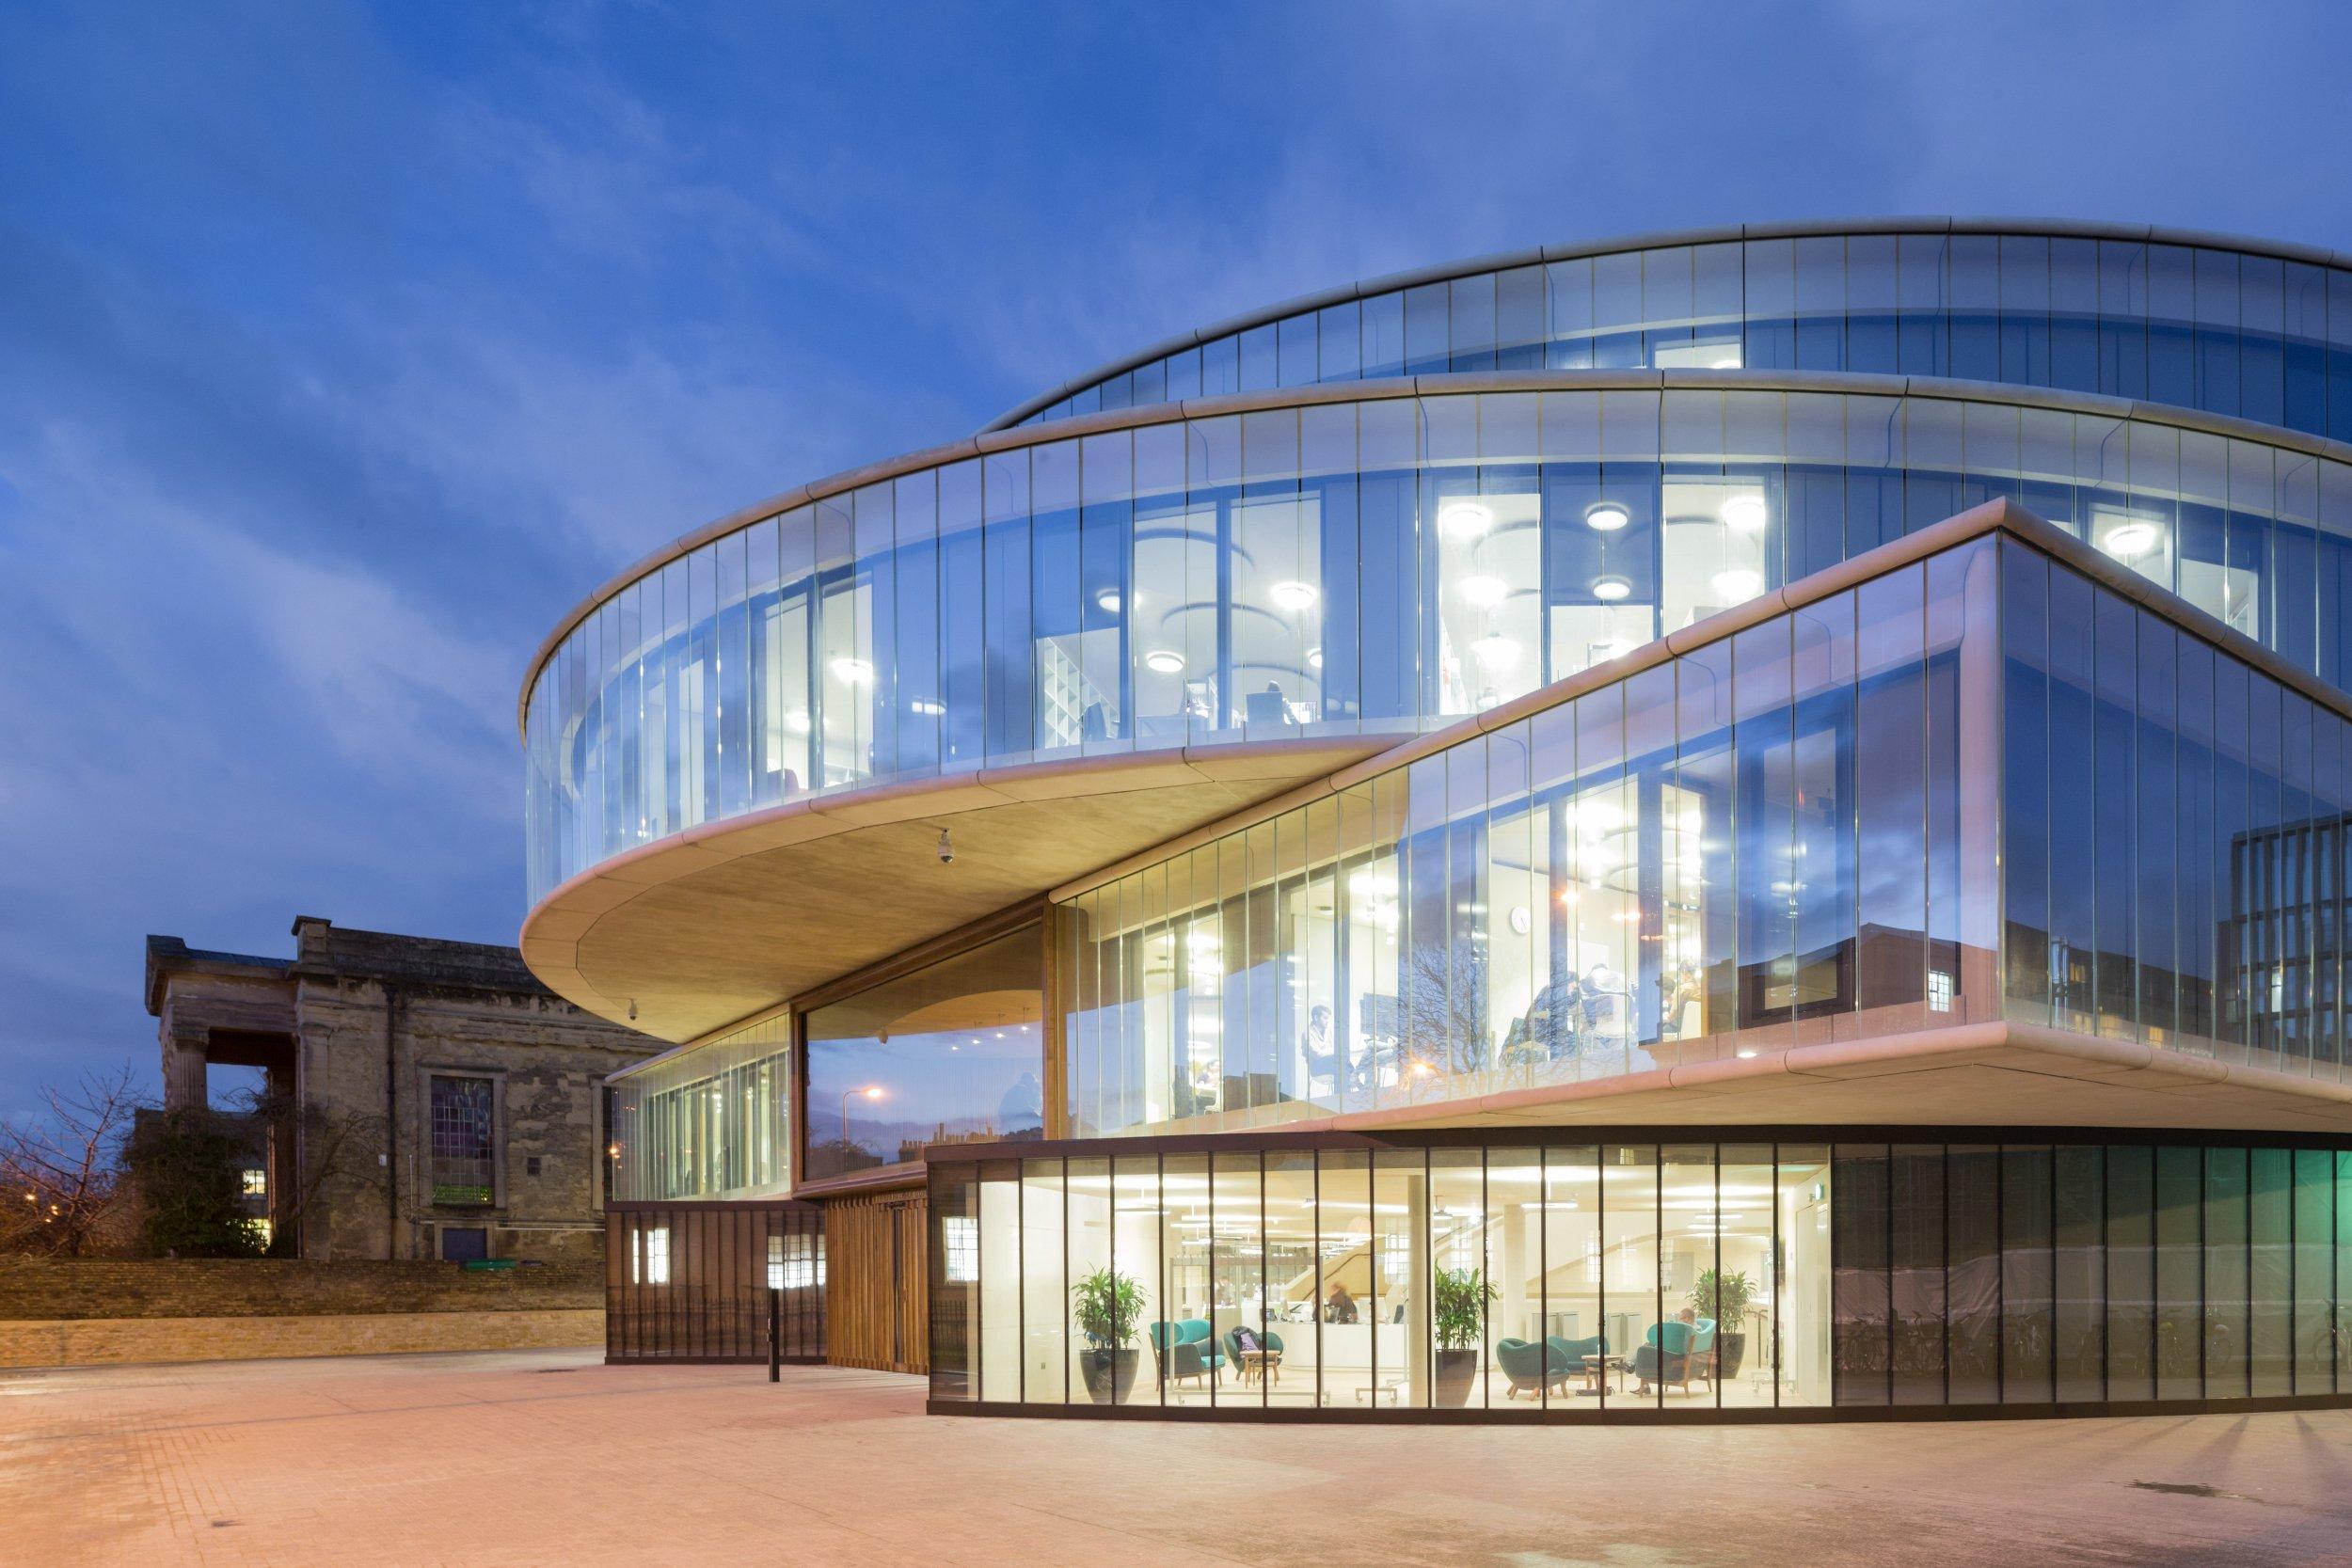 Riba Stirling Prize 2016 Damien Hirst Gallery University